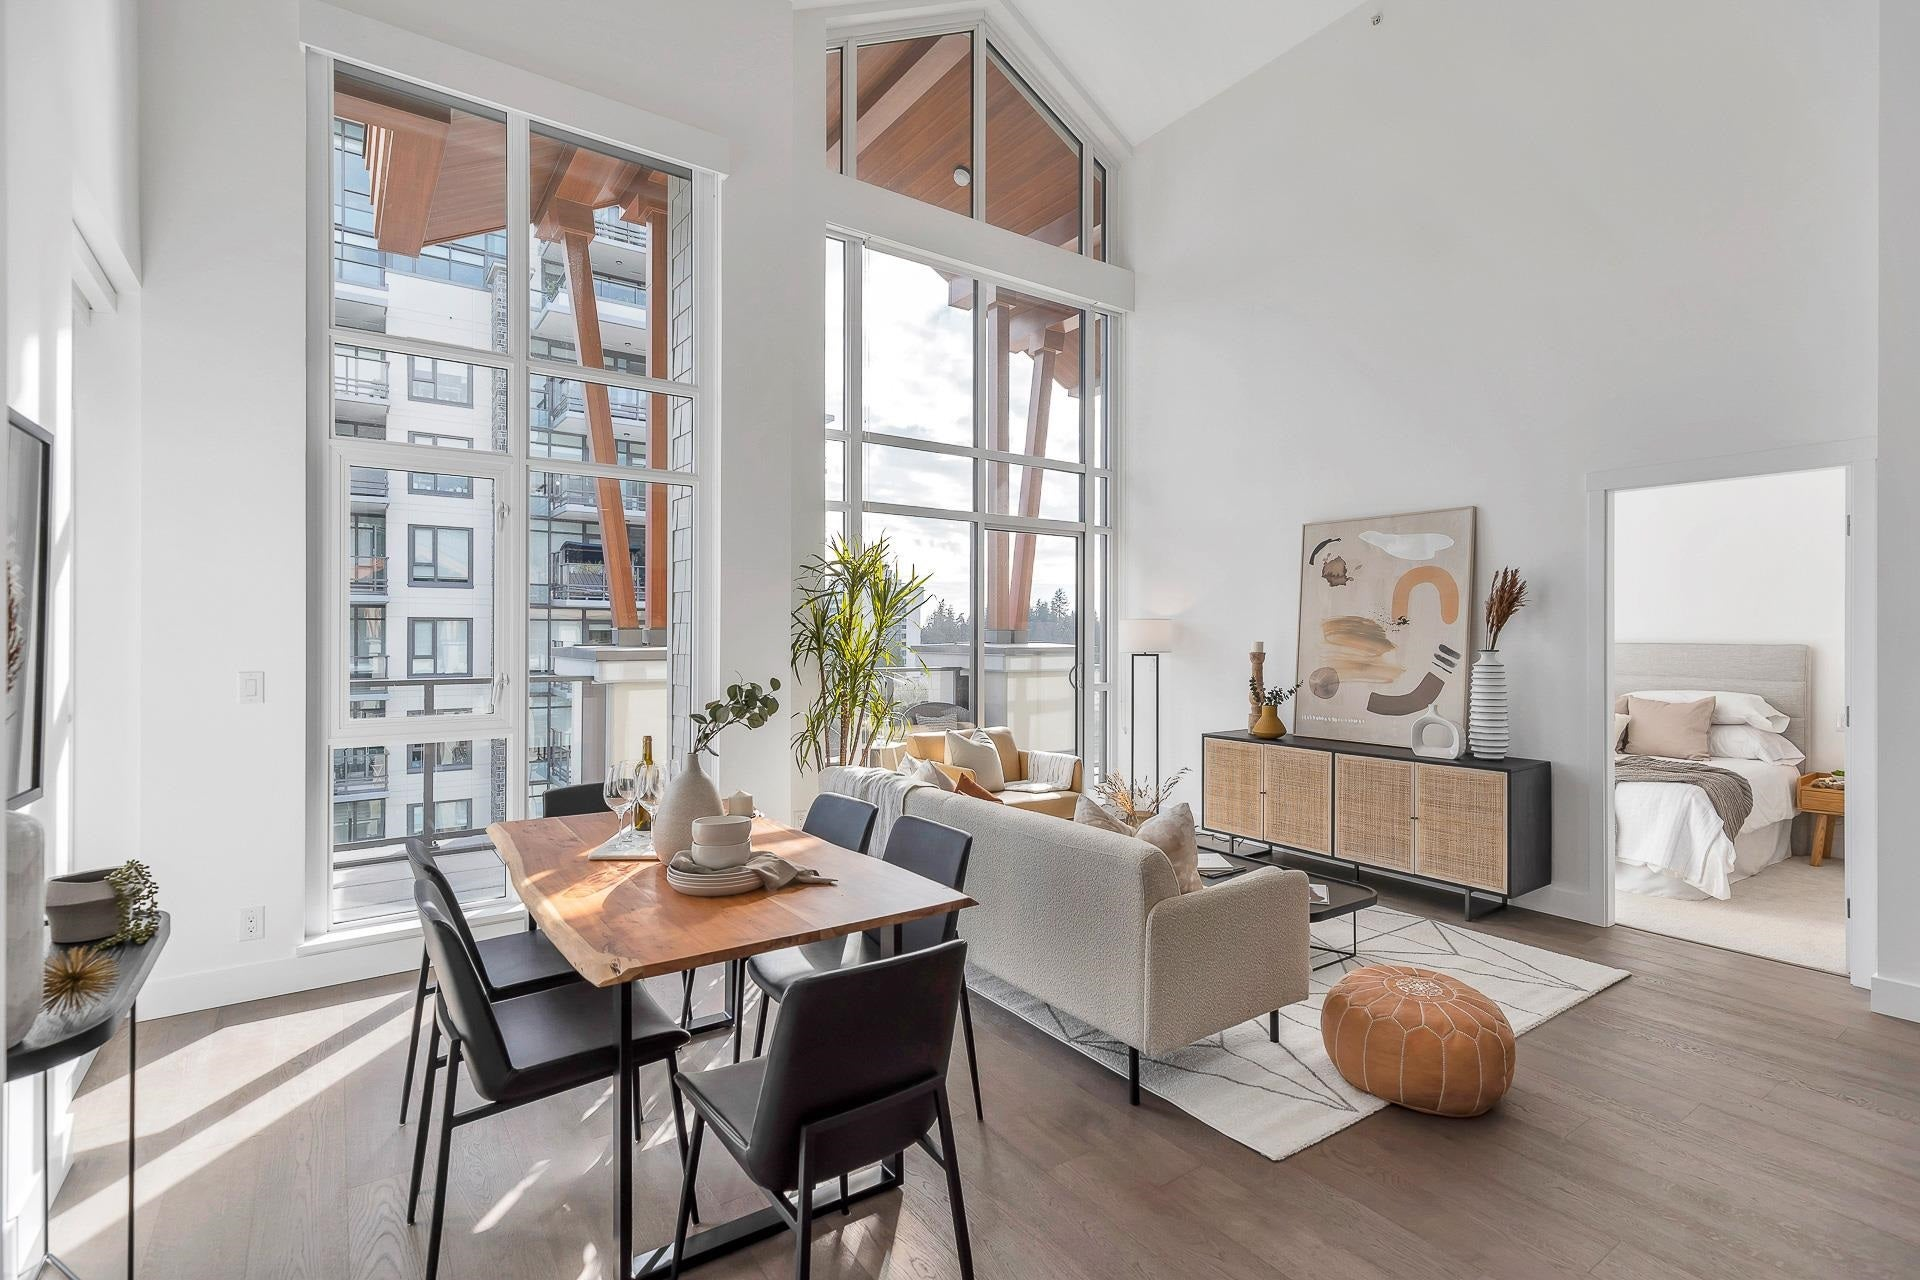 702 2780 VALLEY CENTRE AVENUE - Lynn Valley Apartment/Condo for sale, 3 Bedrooms (R2622279) - #3